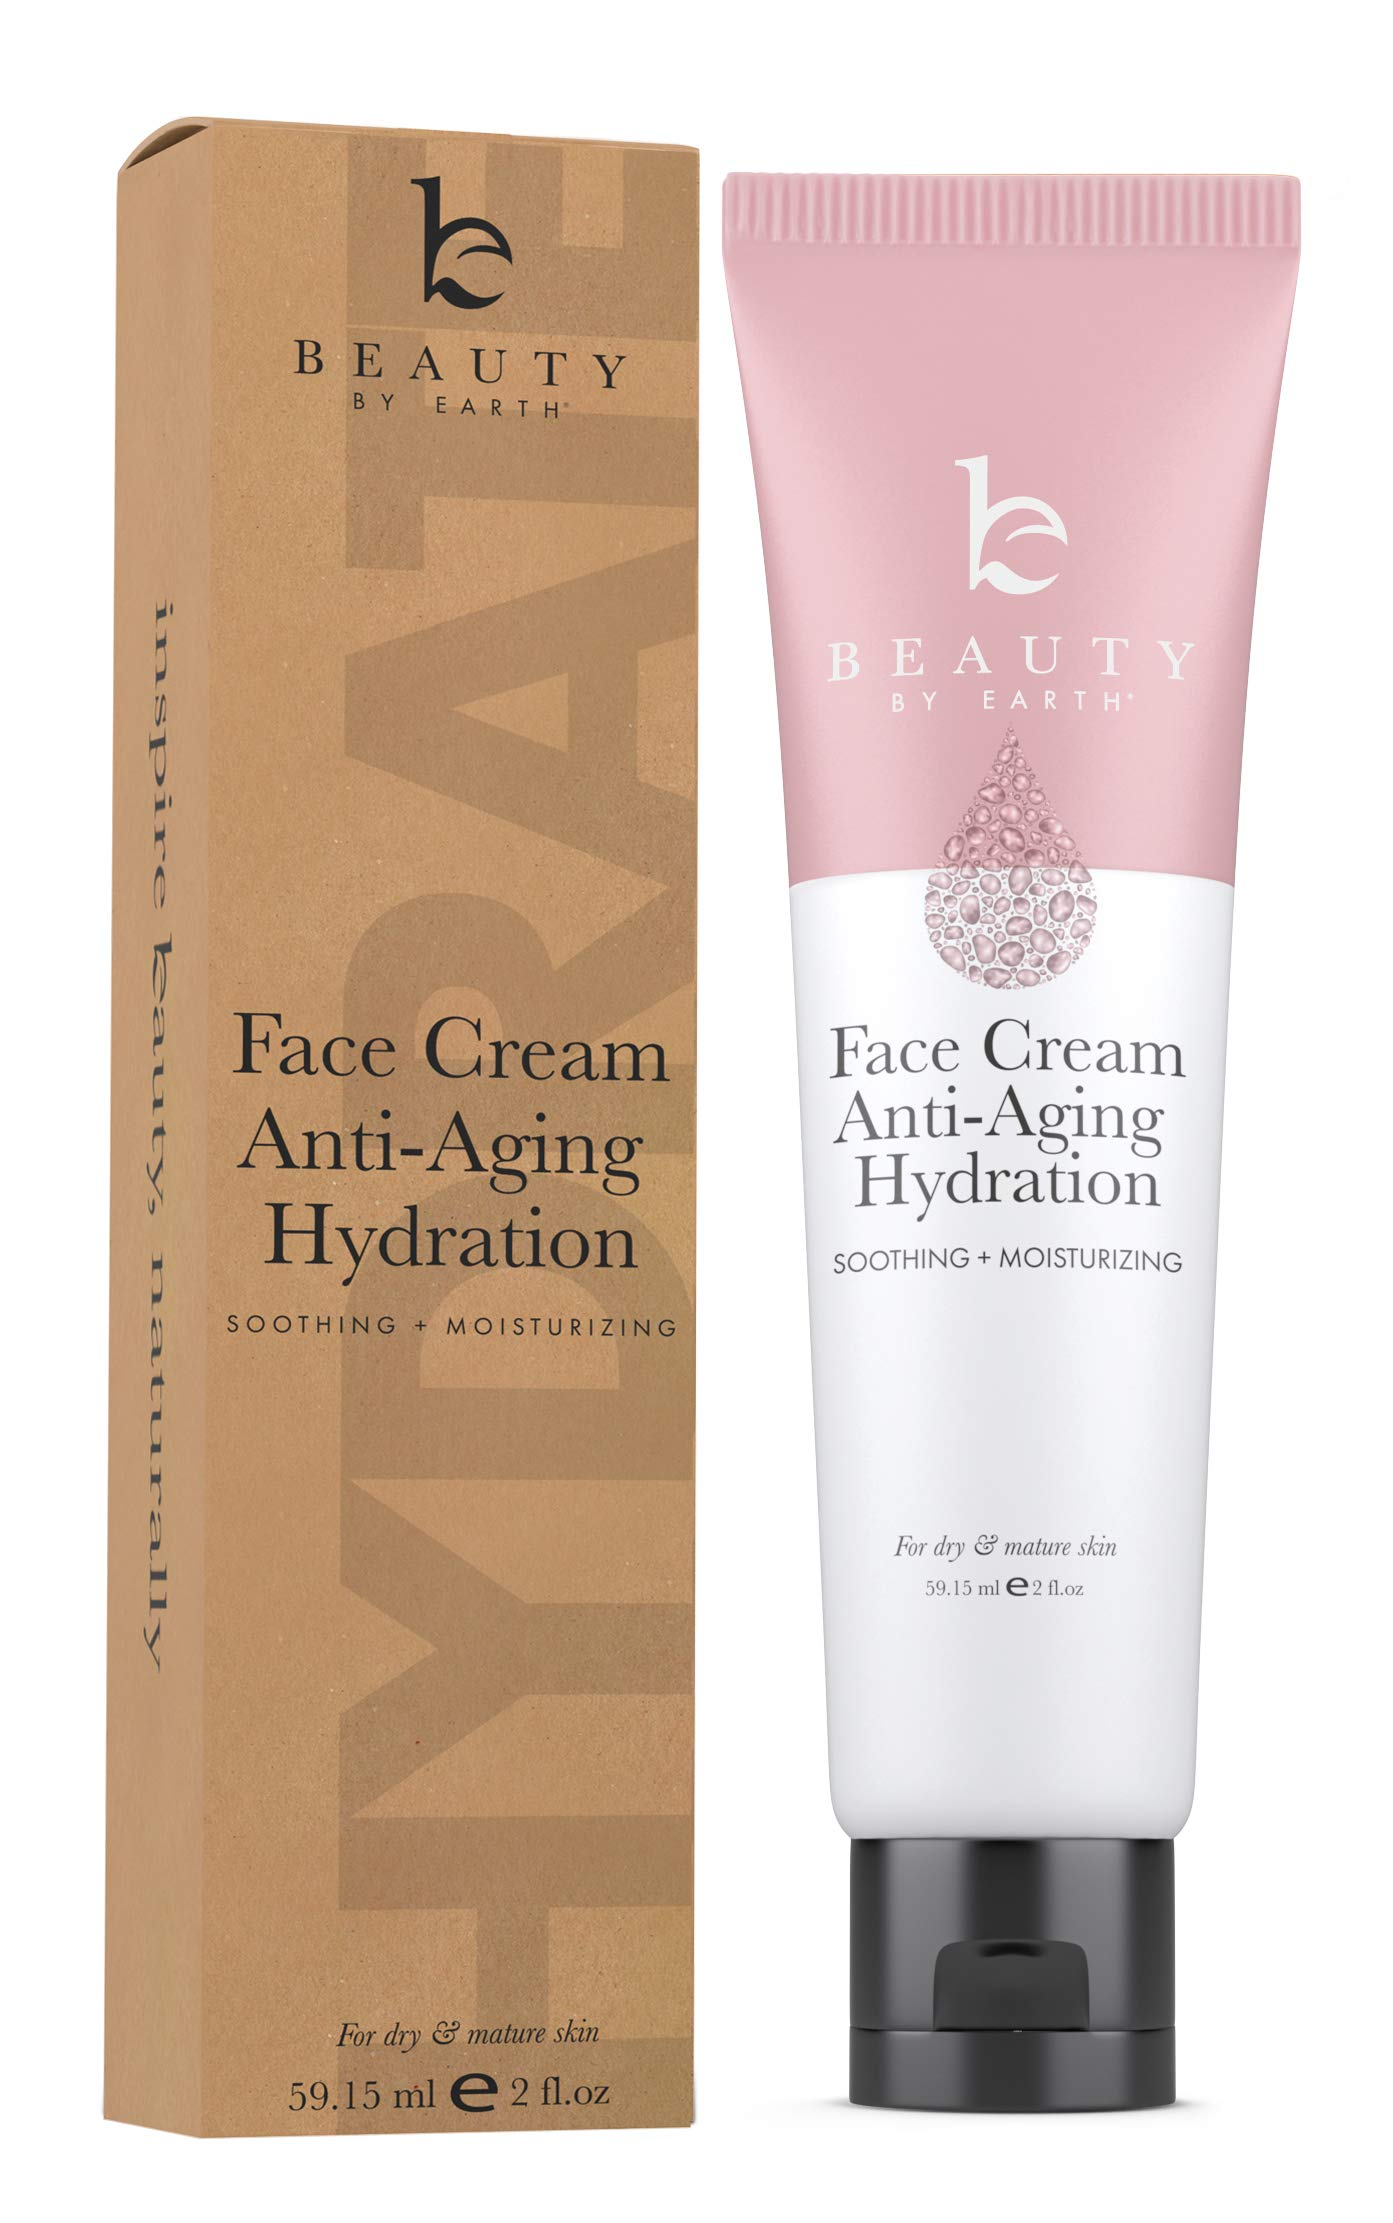 Face Cream Anti Aging Hydration